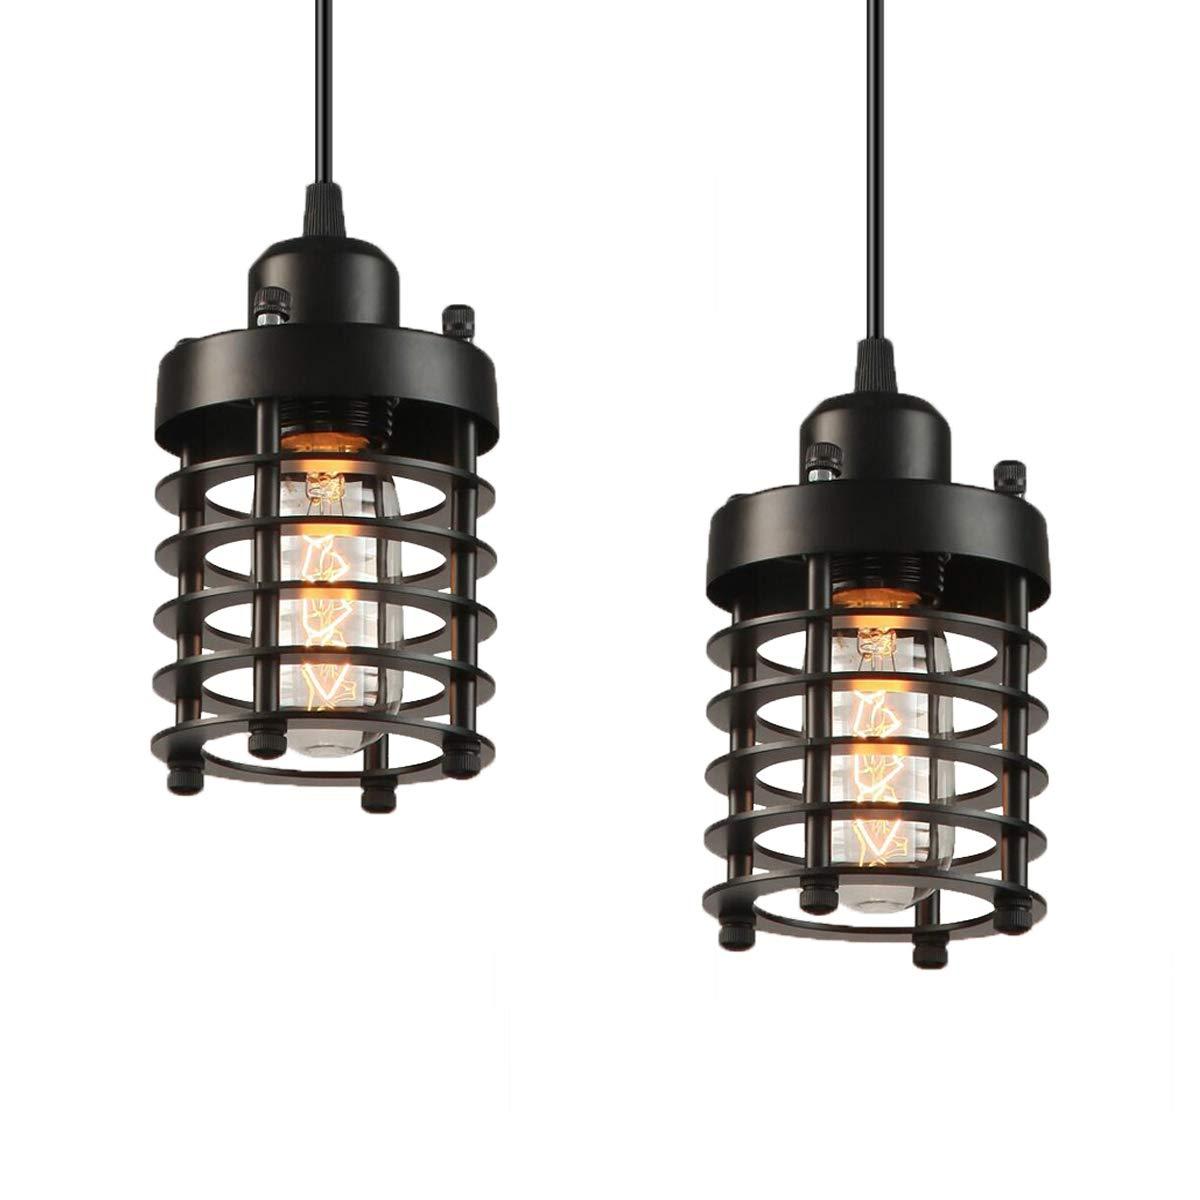 Industrial Pendant Light Licperron E26 E27 Base Edison Caged Industrial Hanging Pendant Light Vintage Pendant Light Fixture 2 Pack